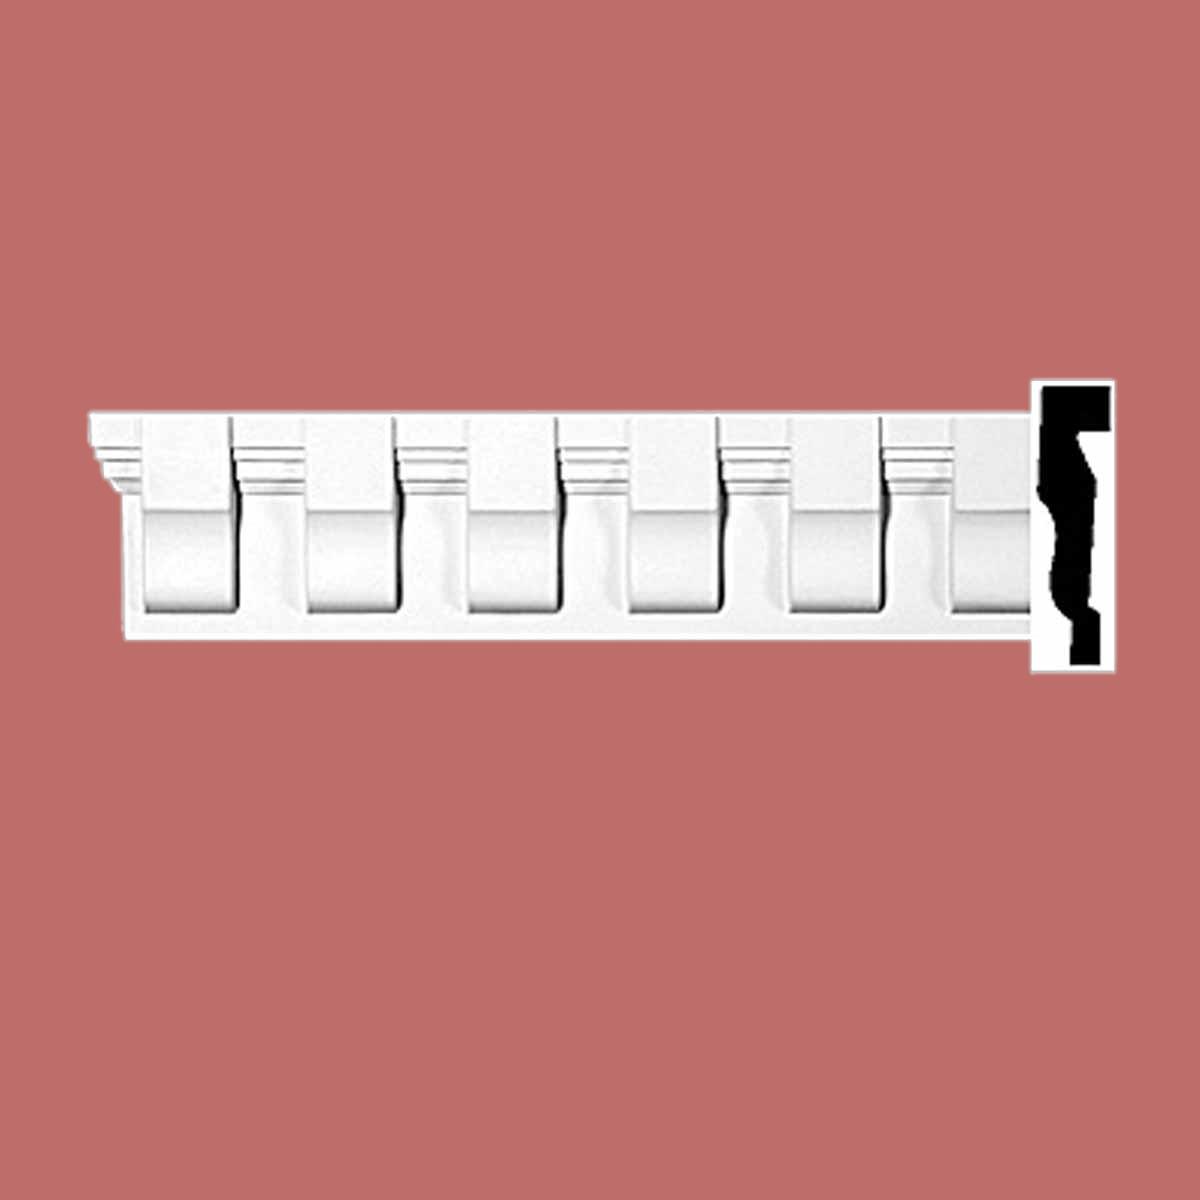 Cornice White Urethane Sample of 11632 23.5 Long Cornice Cornice Moulding Cornice Molding